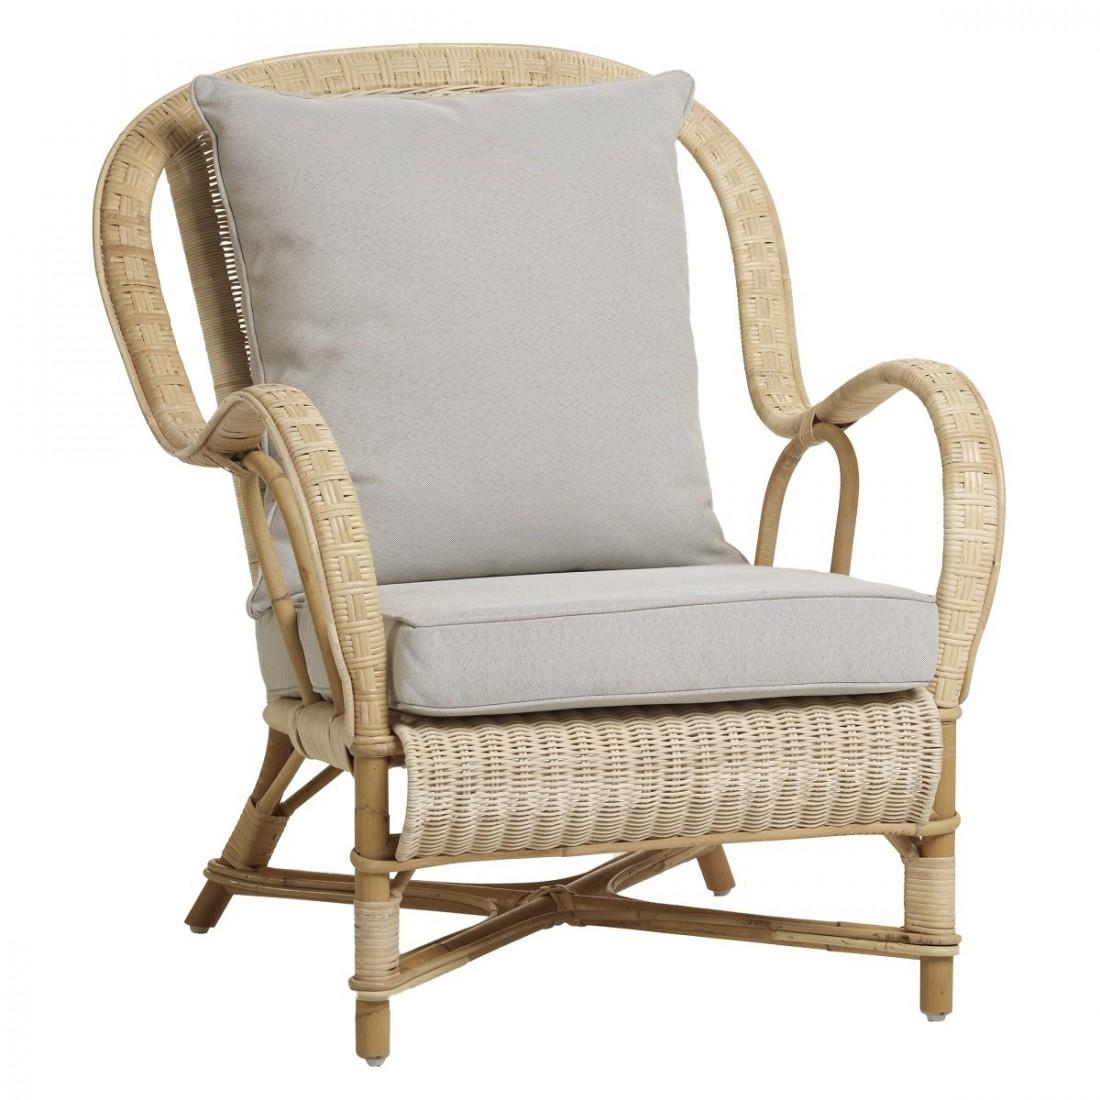 fauteuil en rotin naturel esprit grand p re nantucket. Black Bedroom Furniture Sets. Home Design Ideas